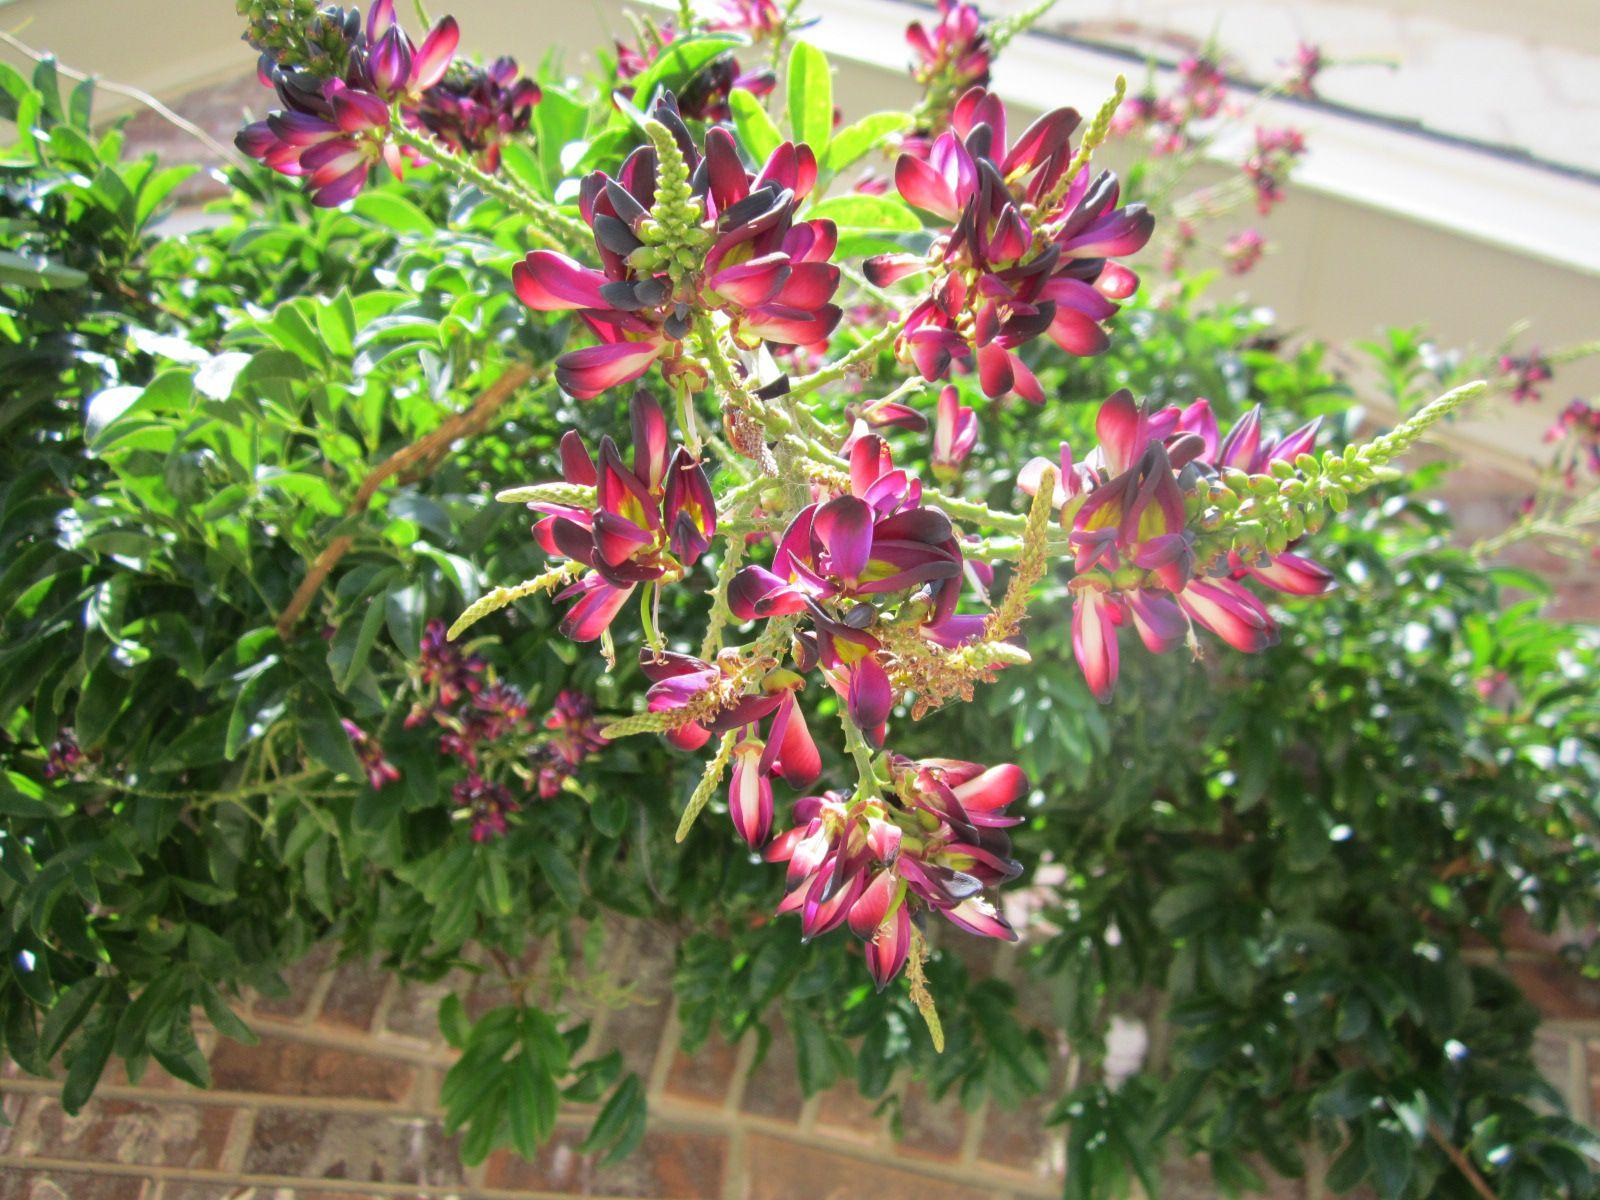 Evergreen Wisteria Reddish Purple Highly Fragrant Pea Like Blooms In 8 Grape Like Clu Drought Tolerant Plants Drought Resistant Plants Deer Resistant Plants